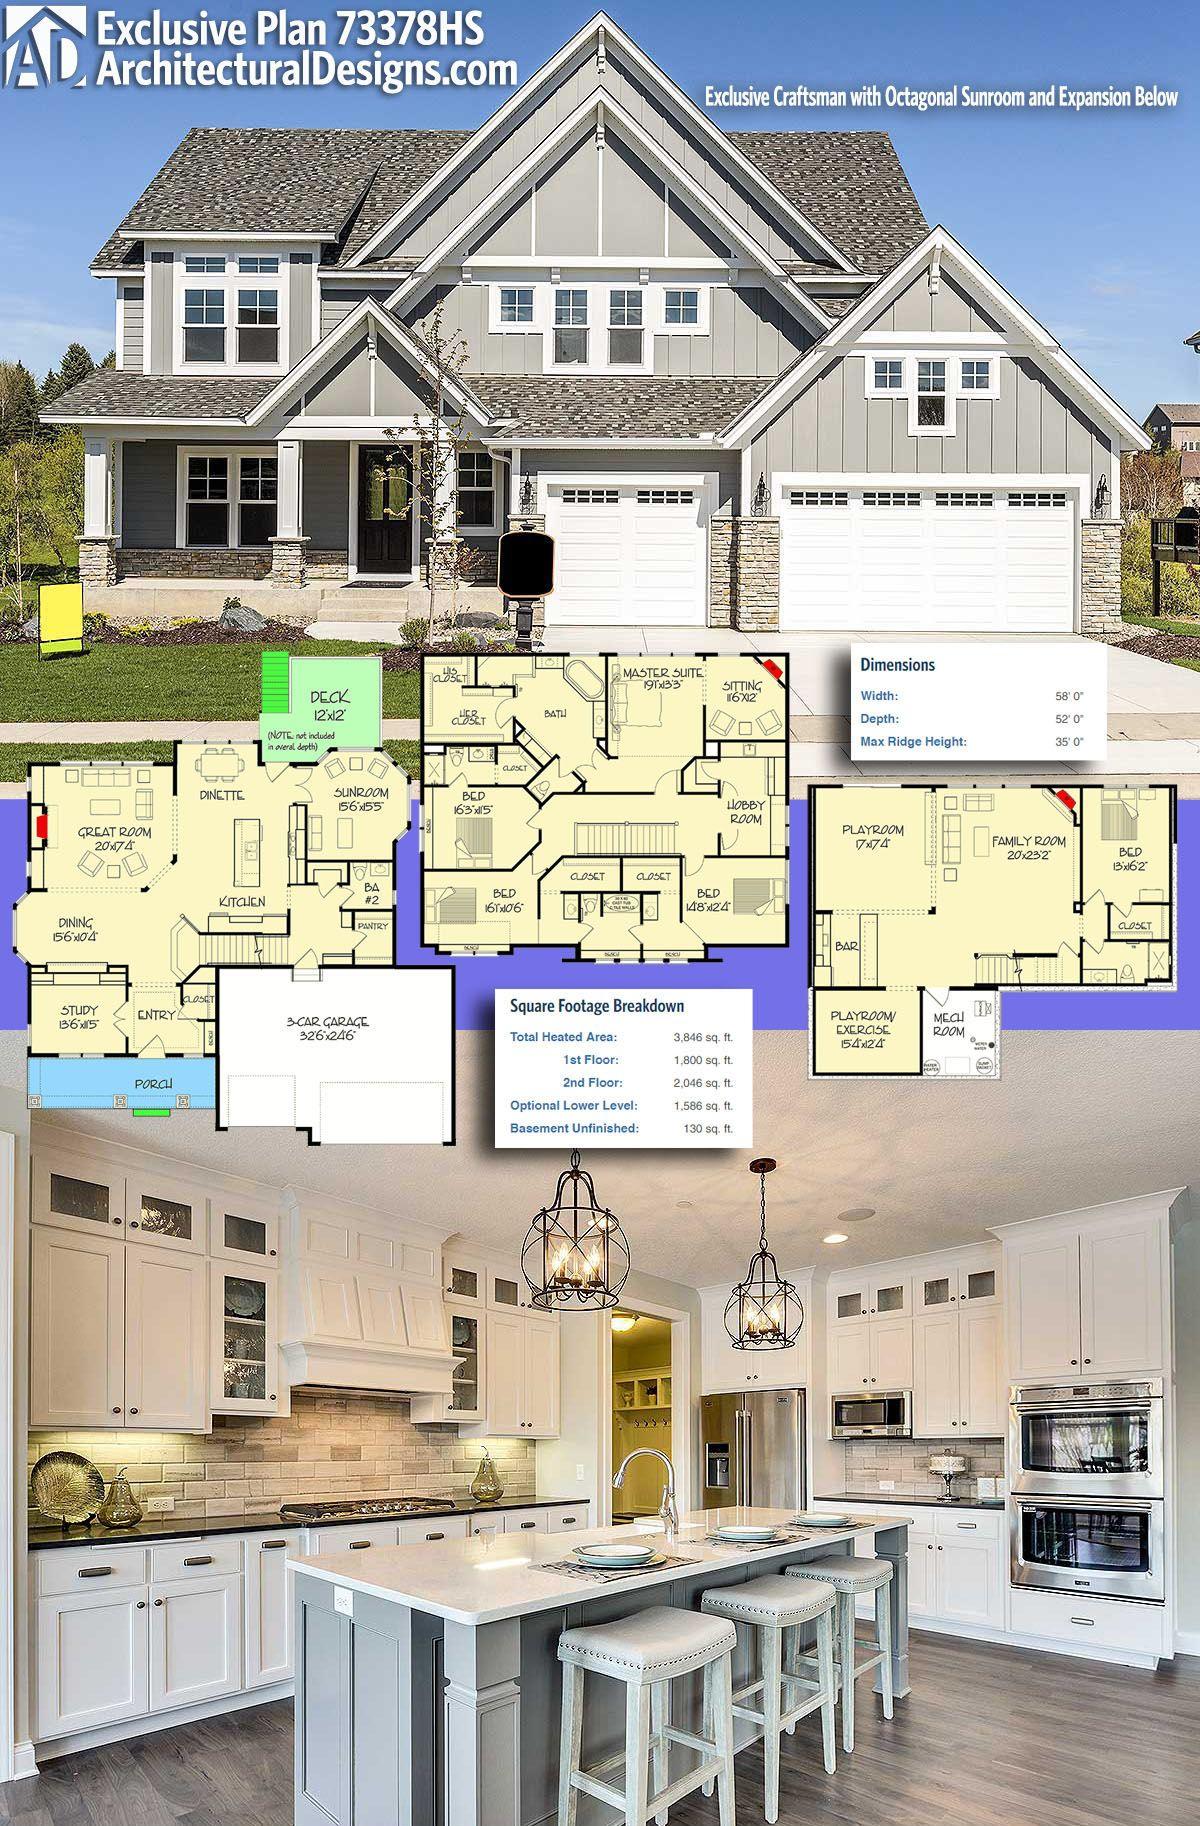 Architecture Architectural Designs Exclusive Craftsman House